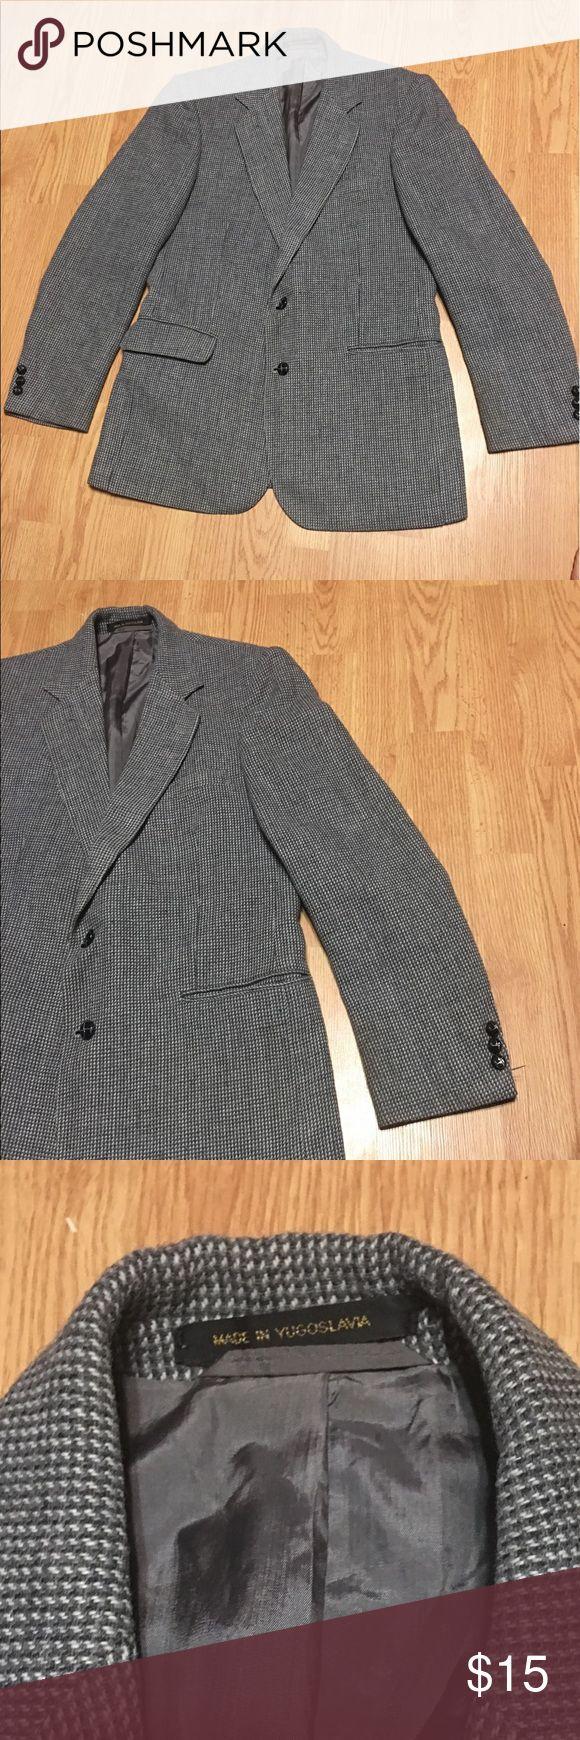 Russel Scott Designer Collection Jacket ! In excellent condition! Best offers considered! Russel Scott Jackets & Coats Bomber & Varsity